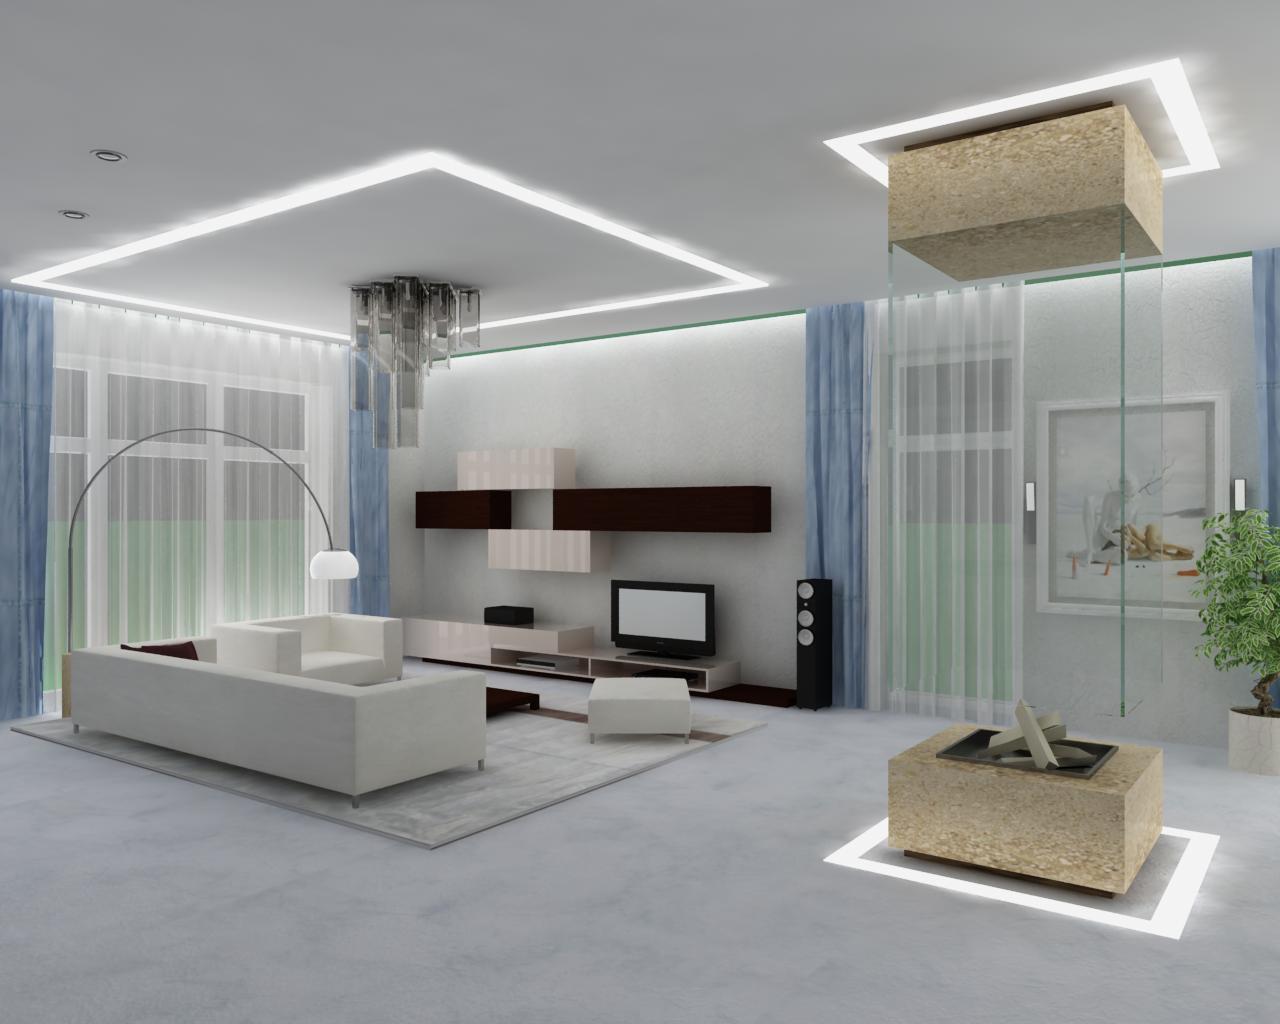 Minimalism: 34 Great Living Room Designs - Decoholic on Minimalist Living Room Design  id=64248